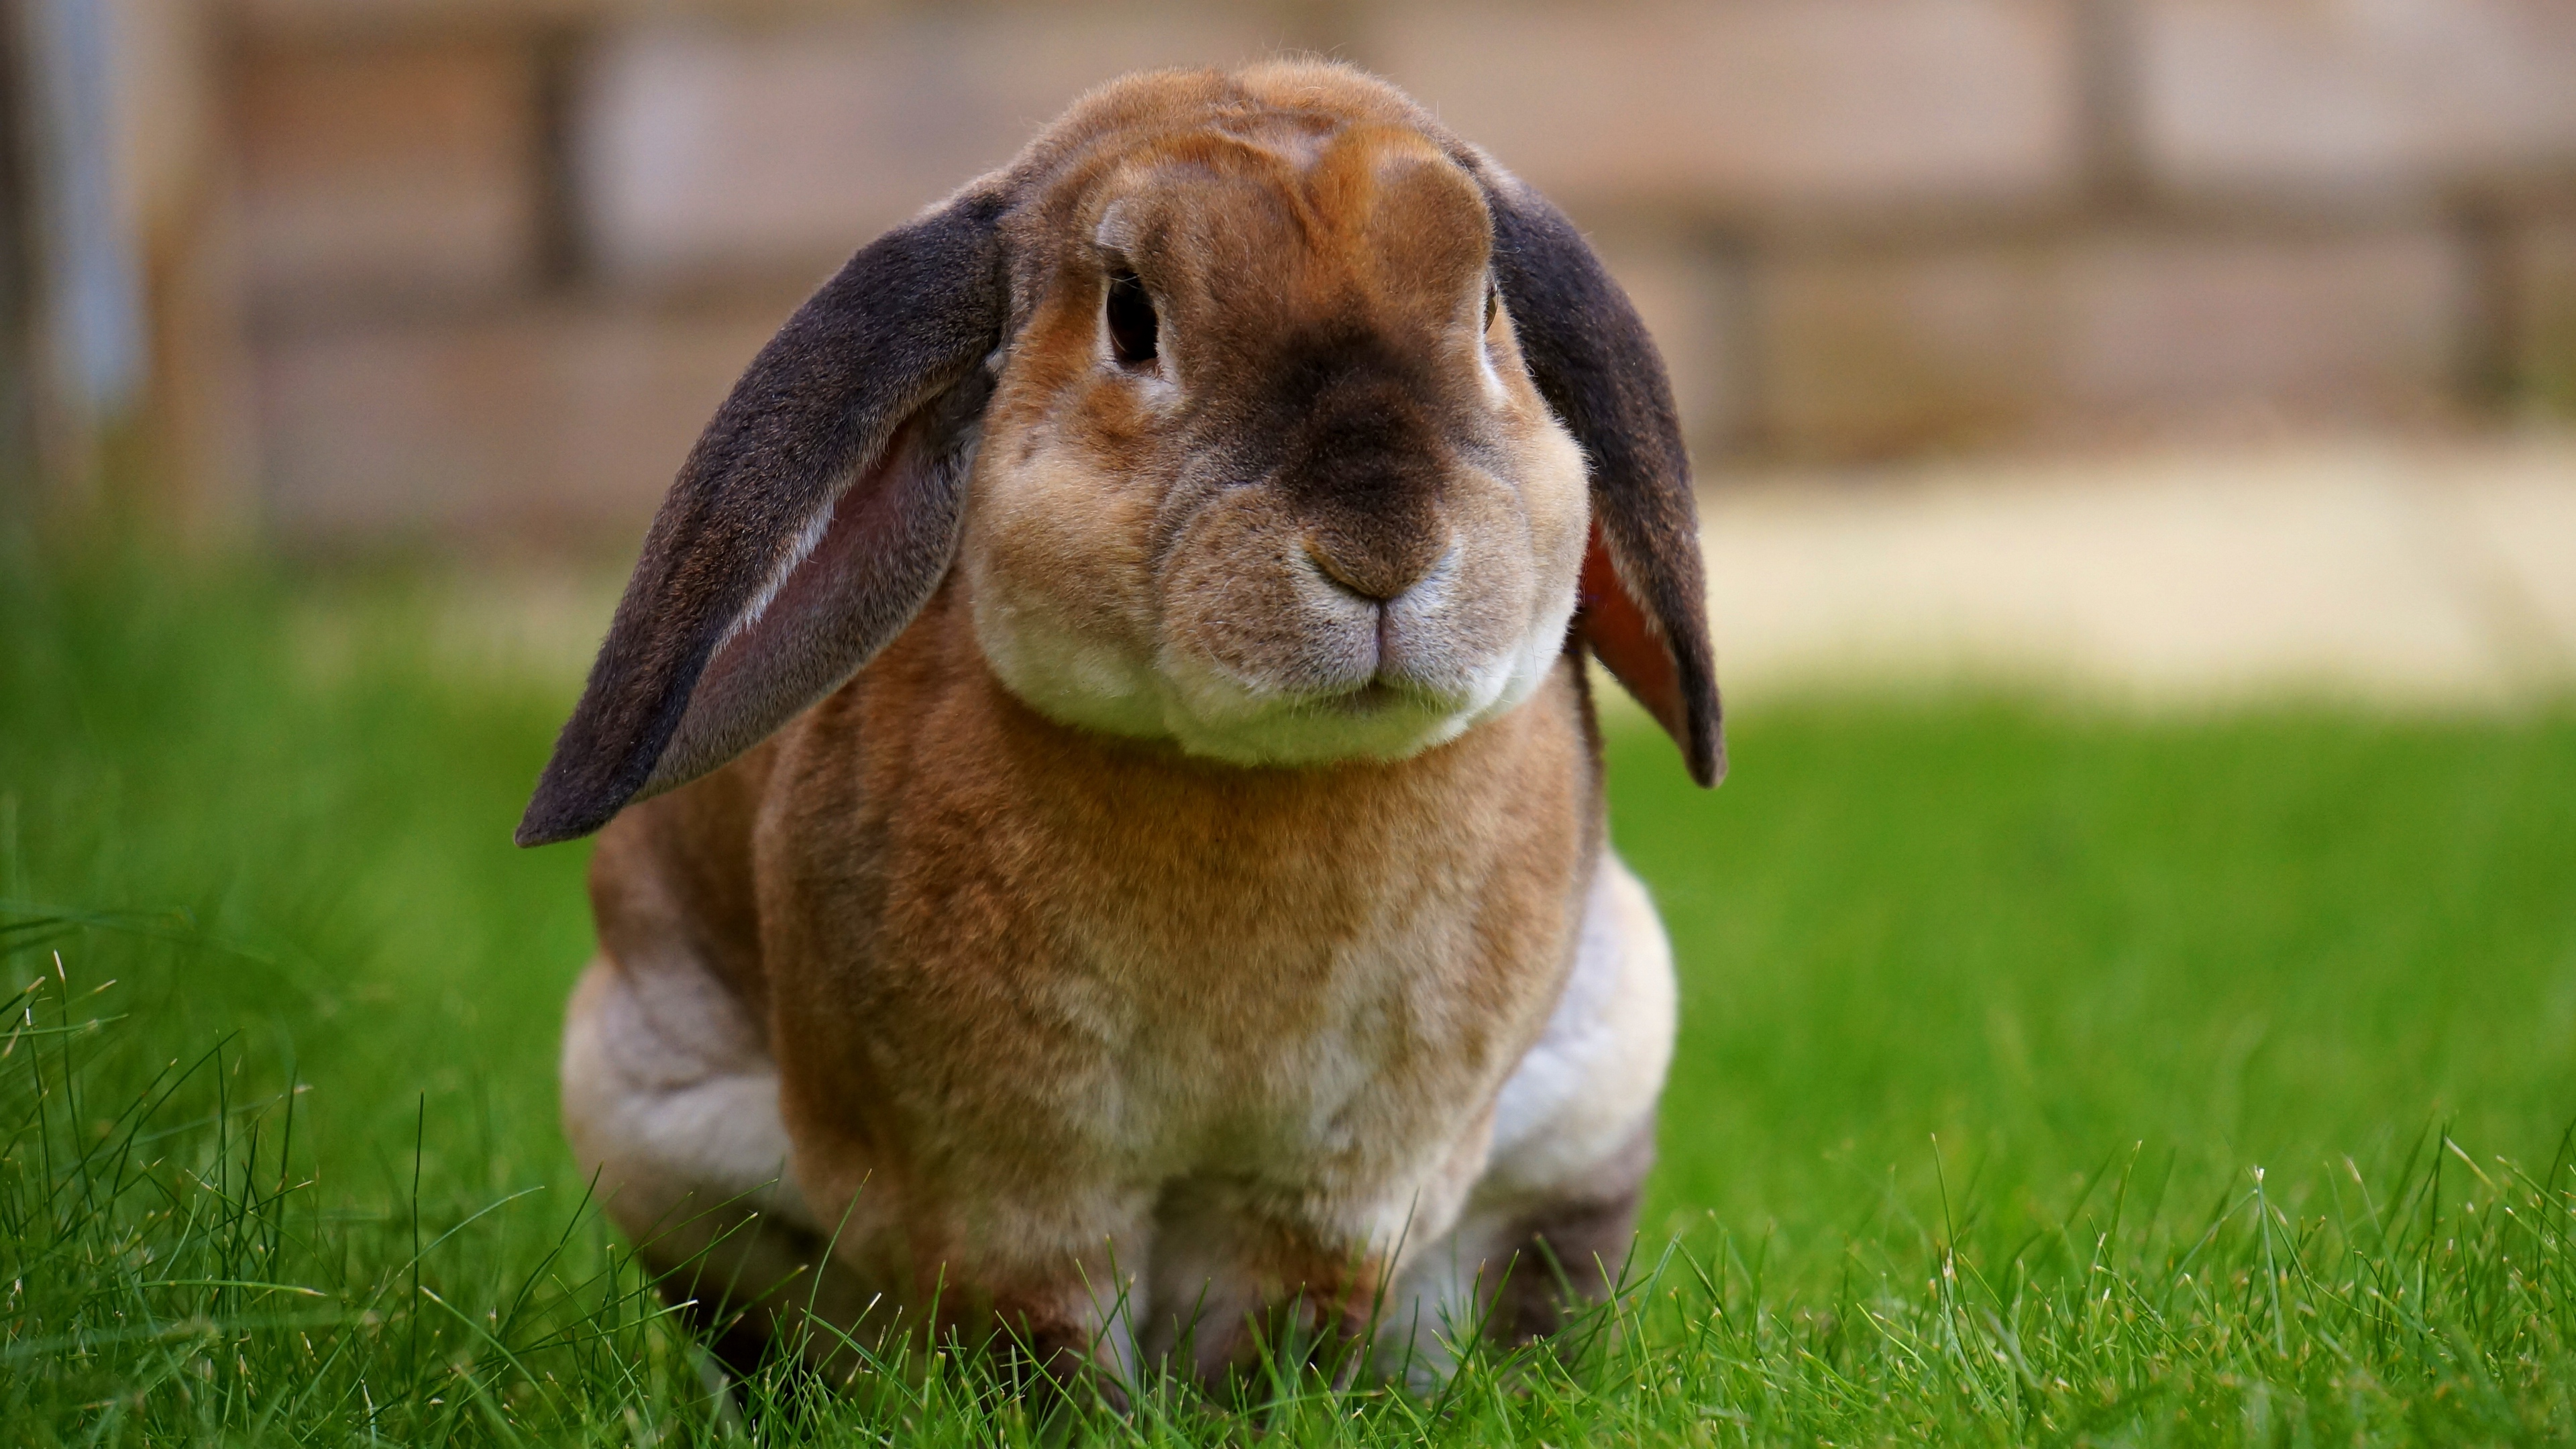 rabbit sitting grass cute 4k 1542241978 - rabbit, sitting, grass, cute 4k - Sitting, Rabbit, Grass